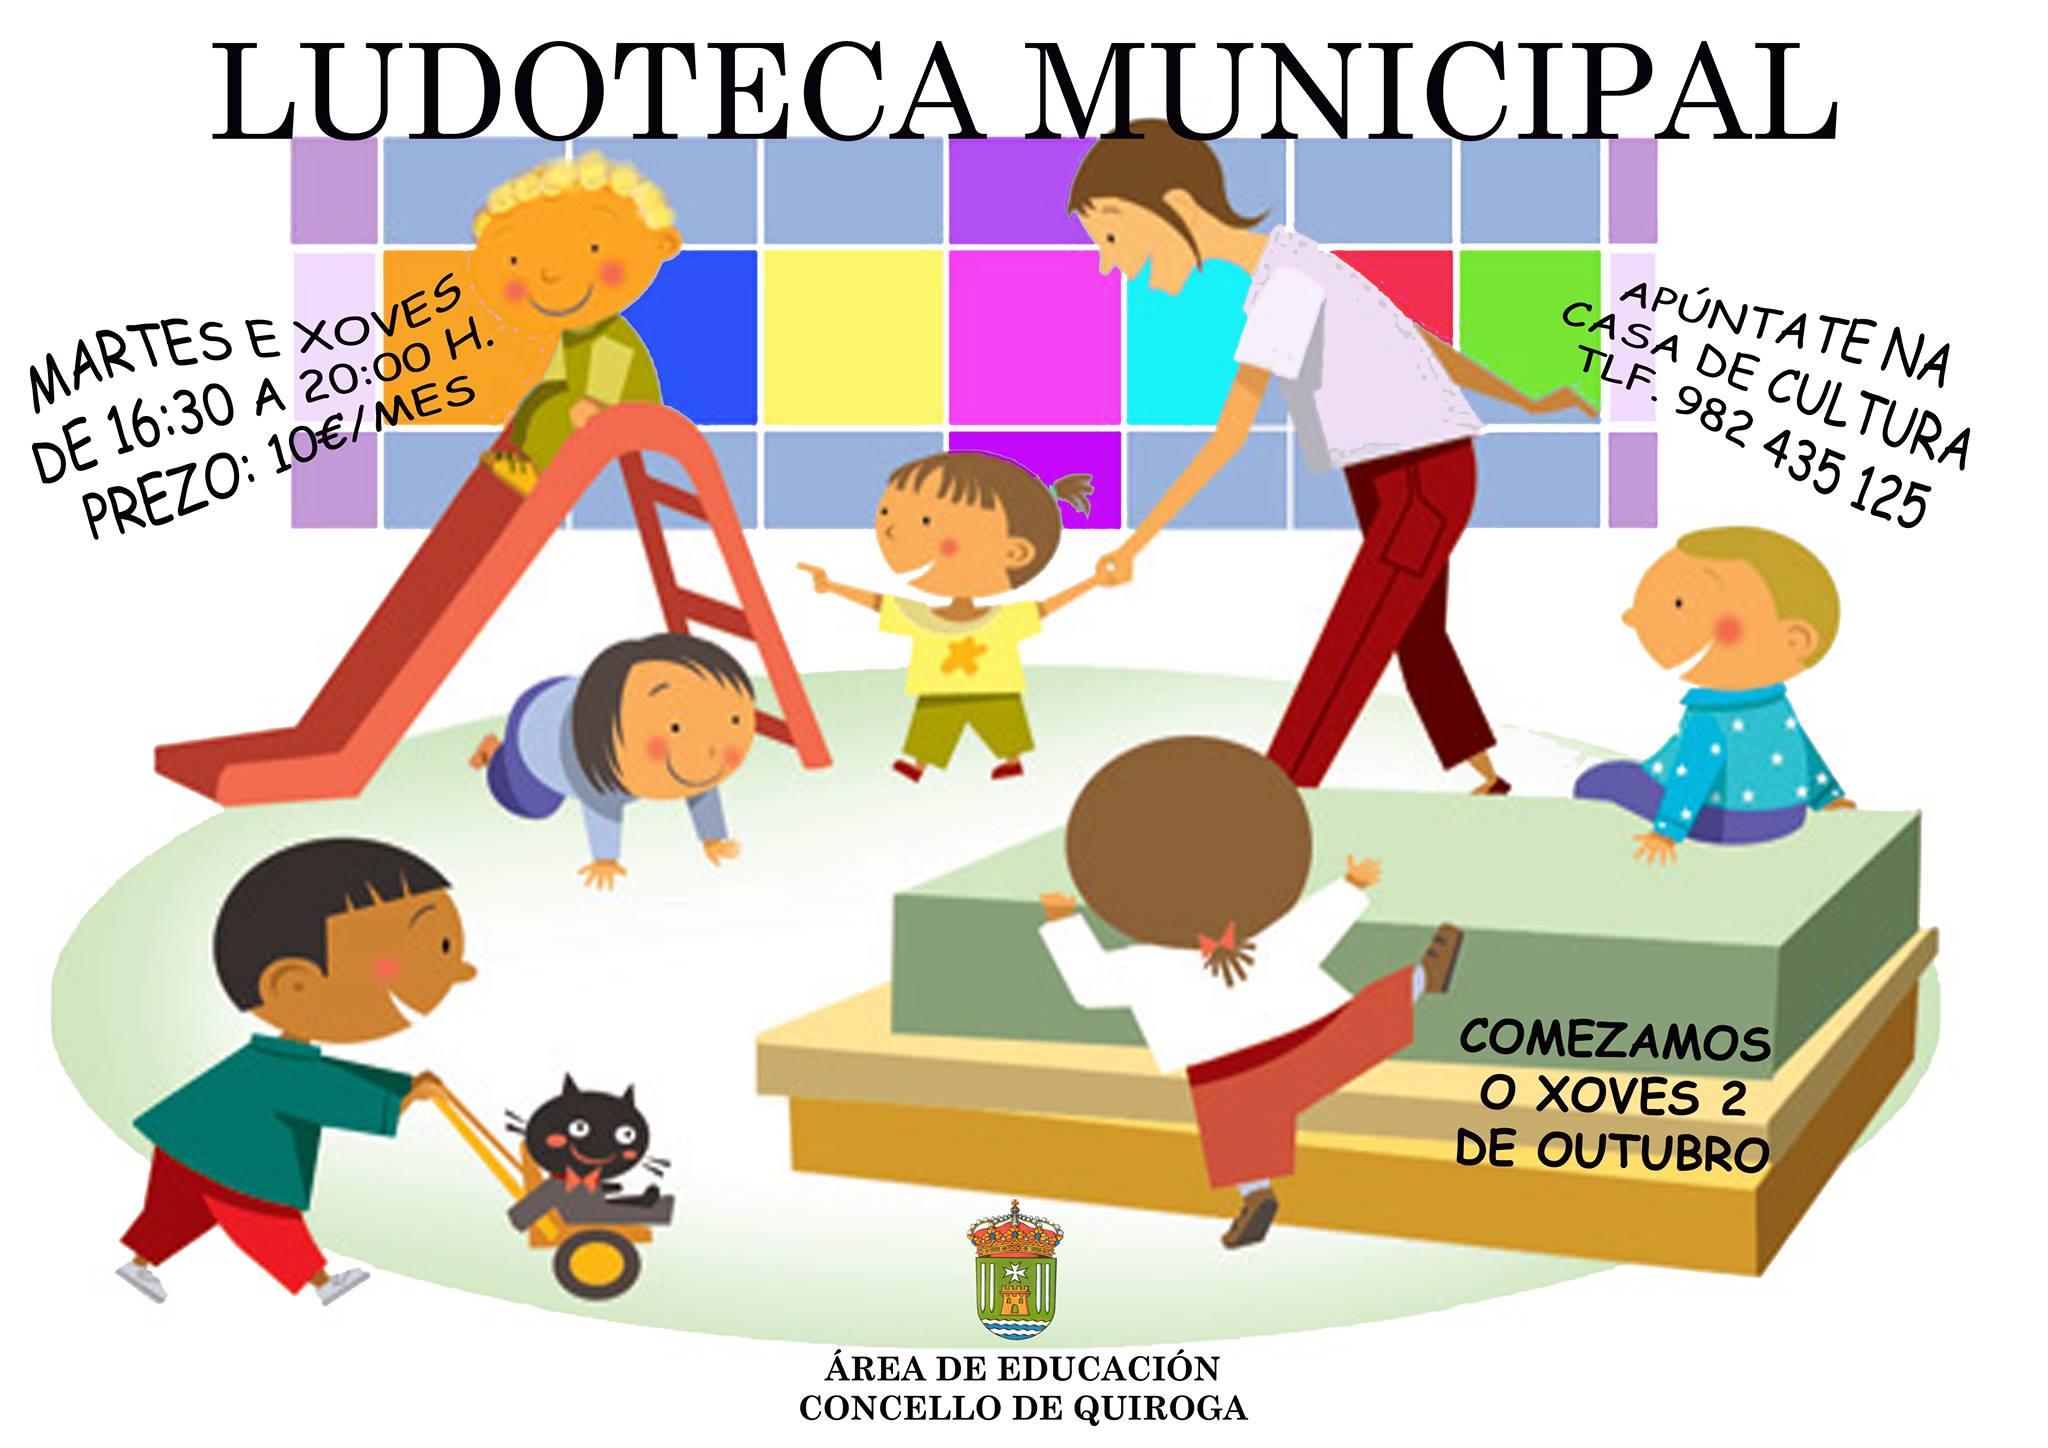 Ludoteca Municipal de Quiroga